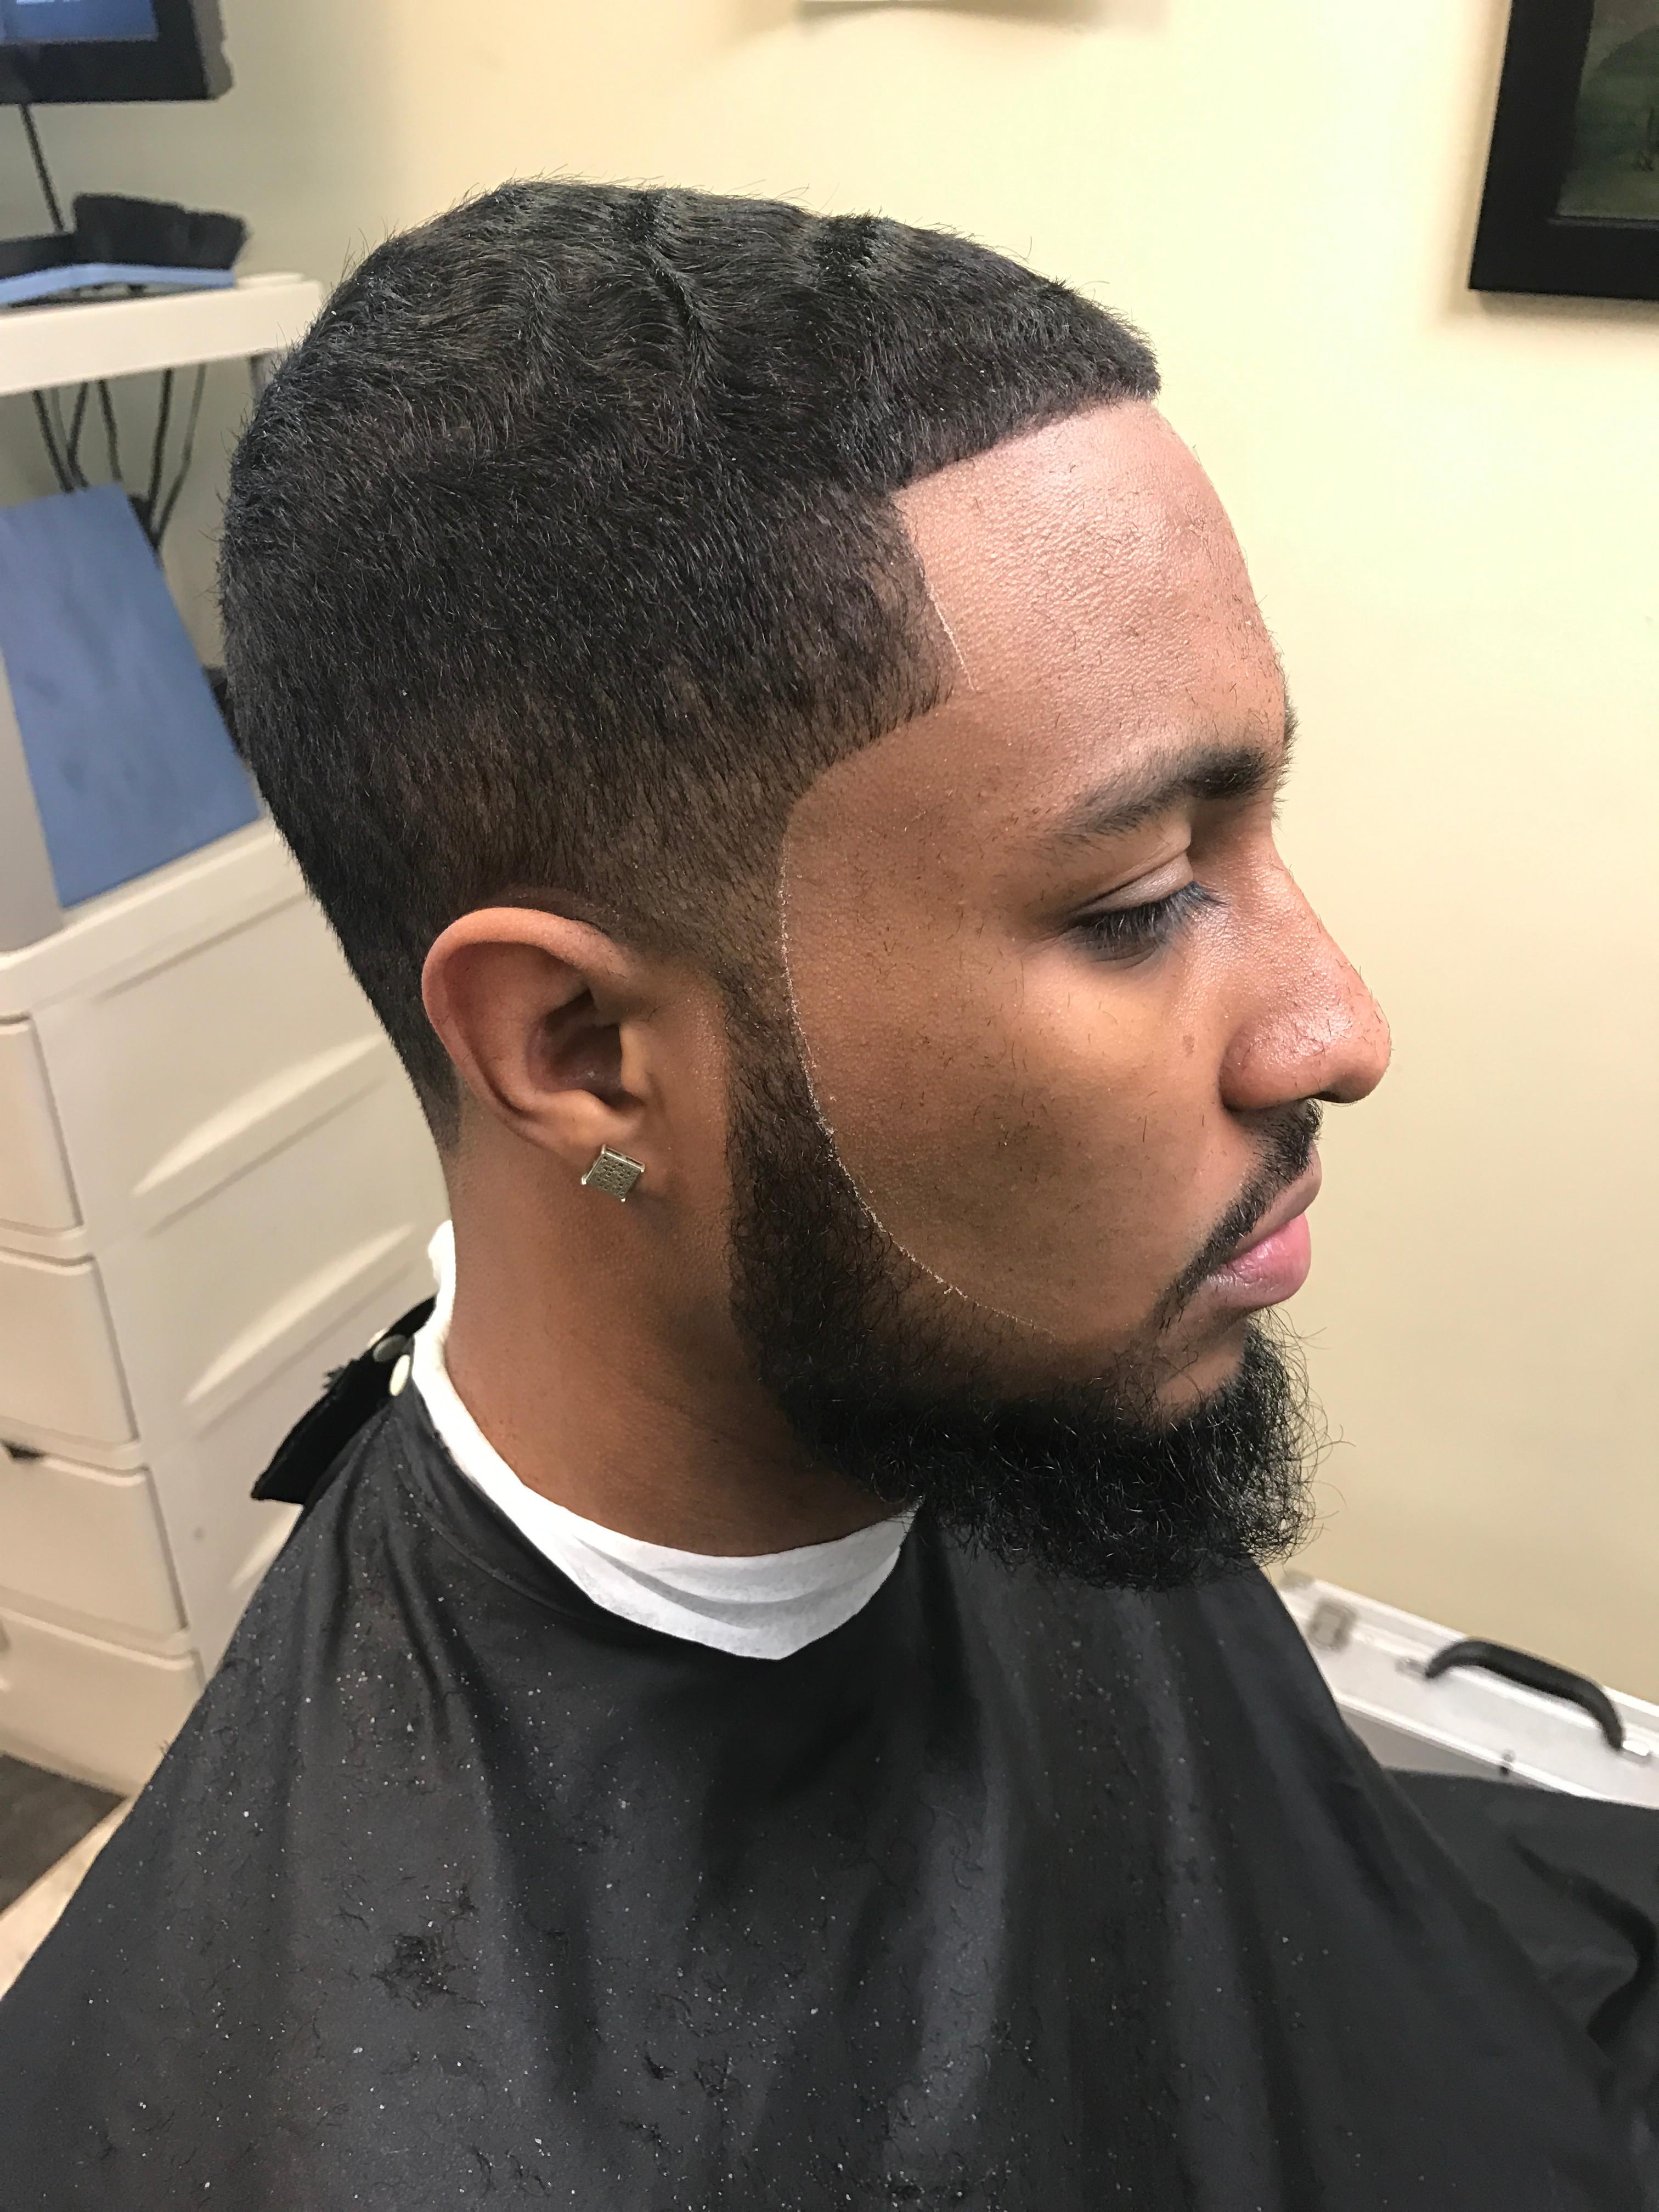 Classic Haircut with beard trim